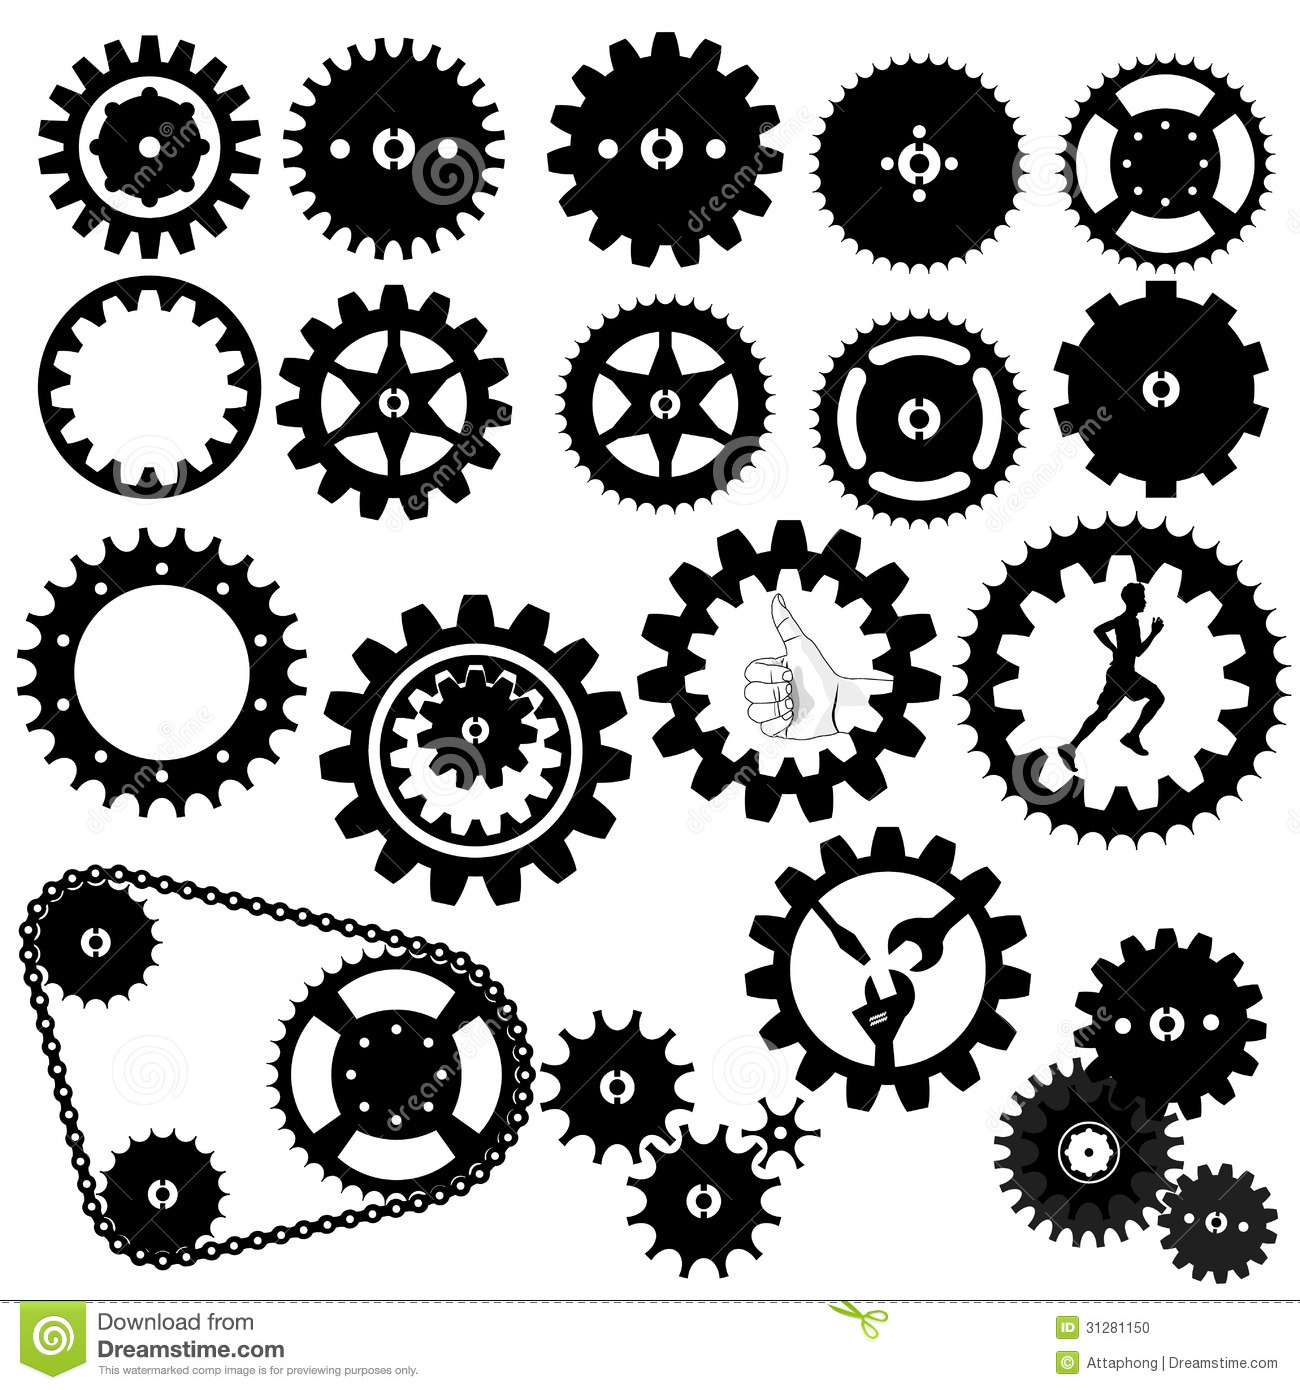 Gears clipart clock gear Clipart Gear cliparts Silhouette Gears